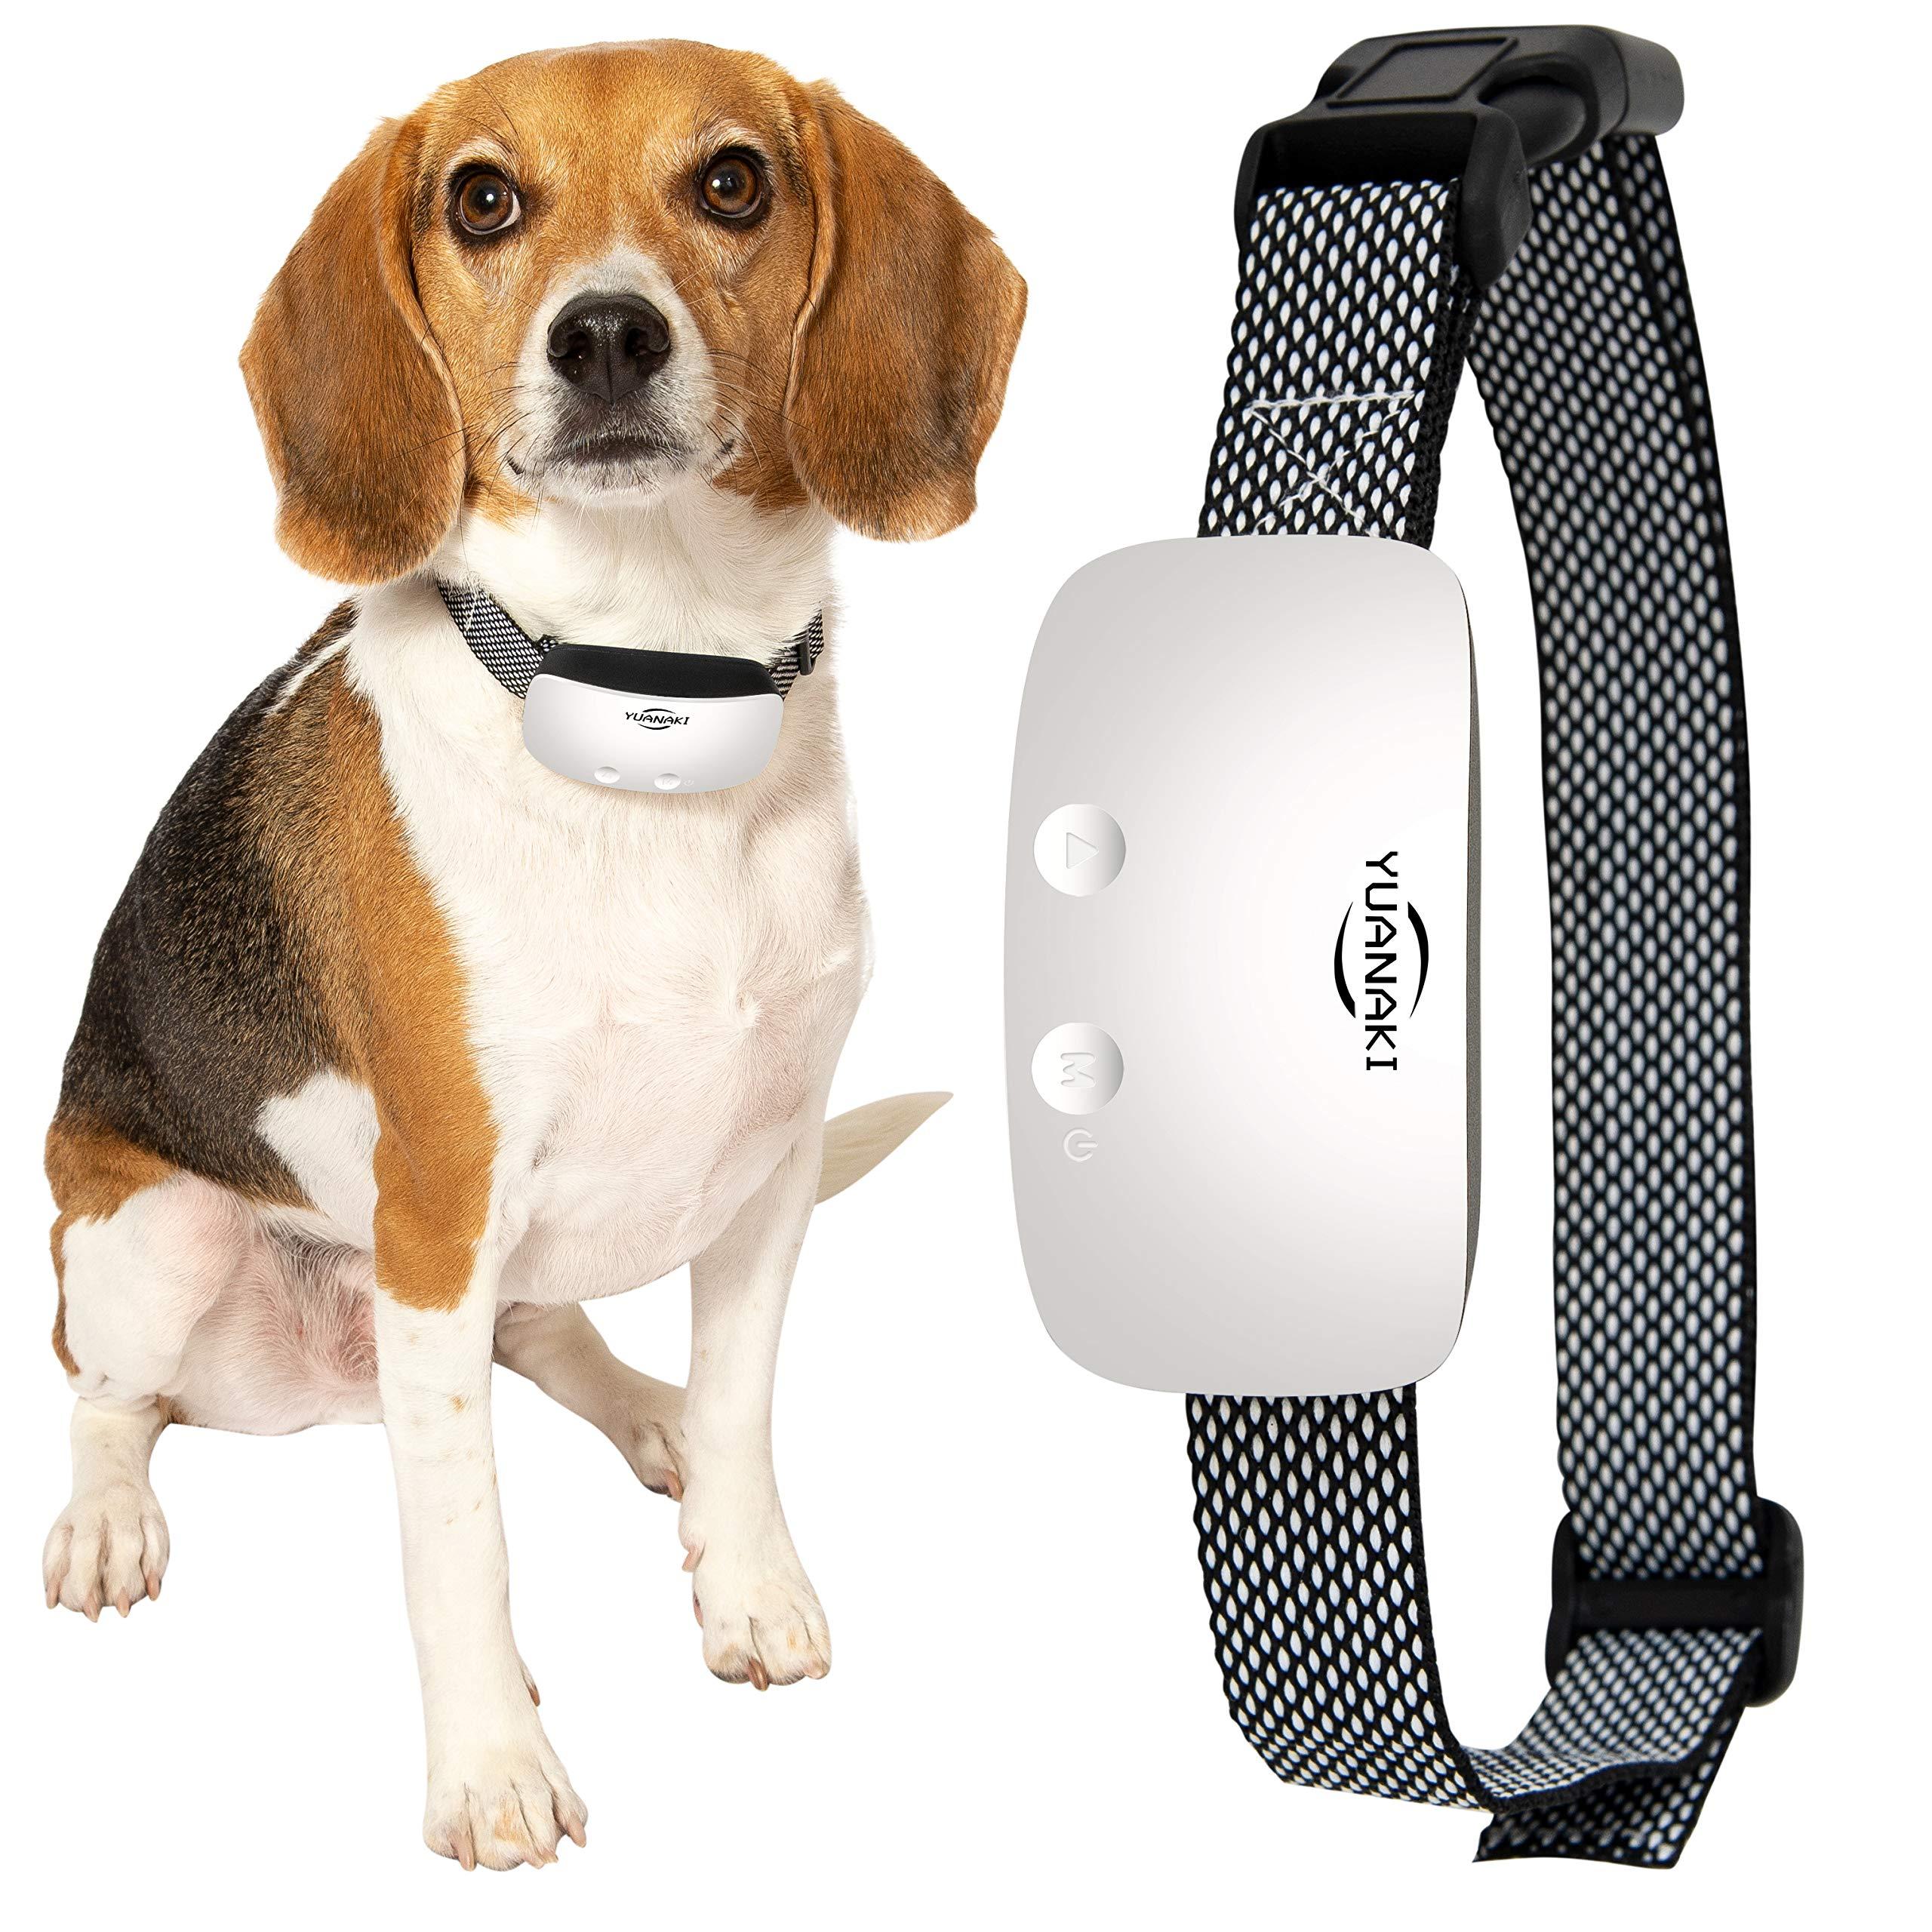 Yuanaki Anti Bark Dog Collar - Backlight LED, IP67 Waterproof, Adjustable, USB Rechargeable - Gentle Shock, Vibration, Beeping - Antibarking Correction and Training Supplies - Smart Automatic Sensor by Yuanaki